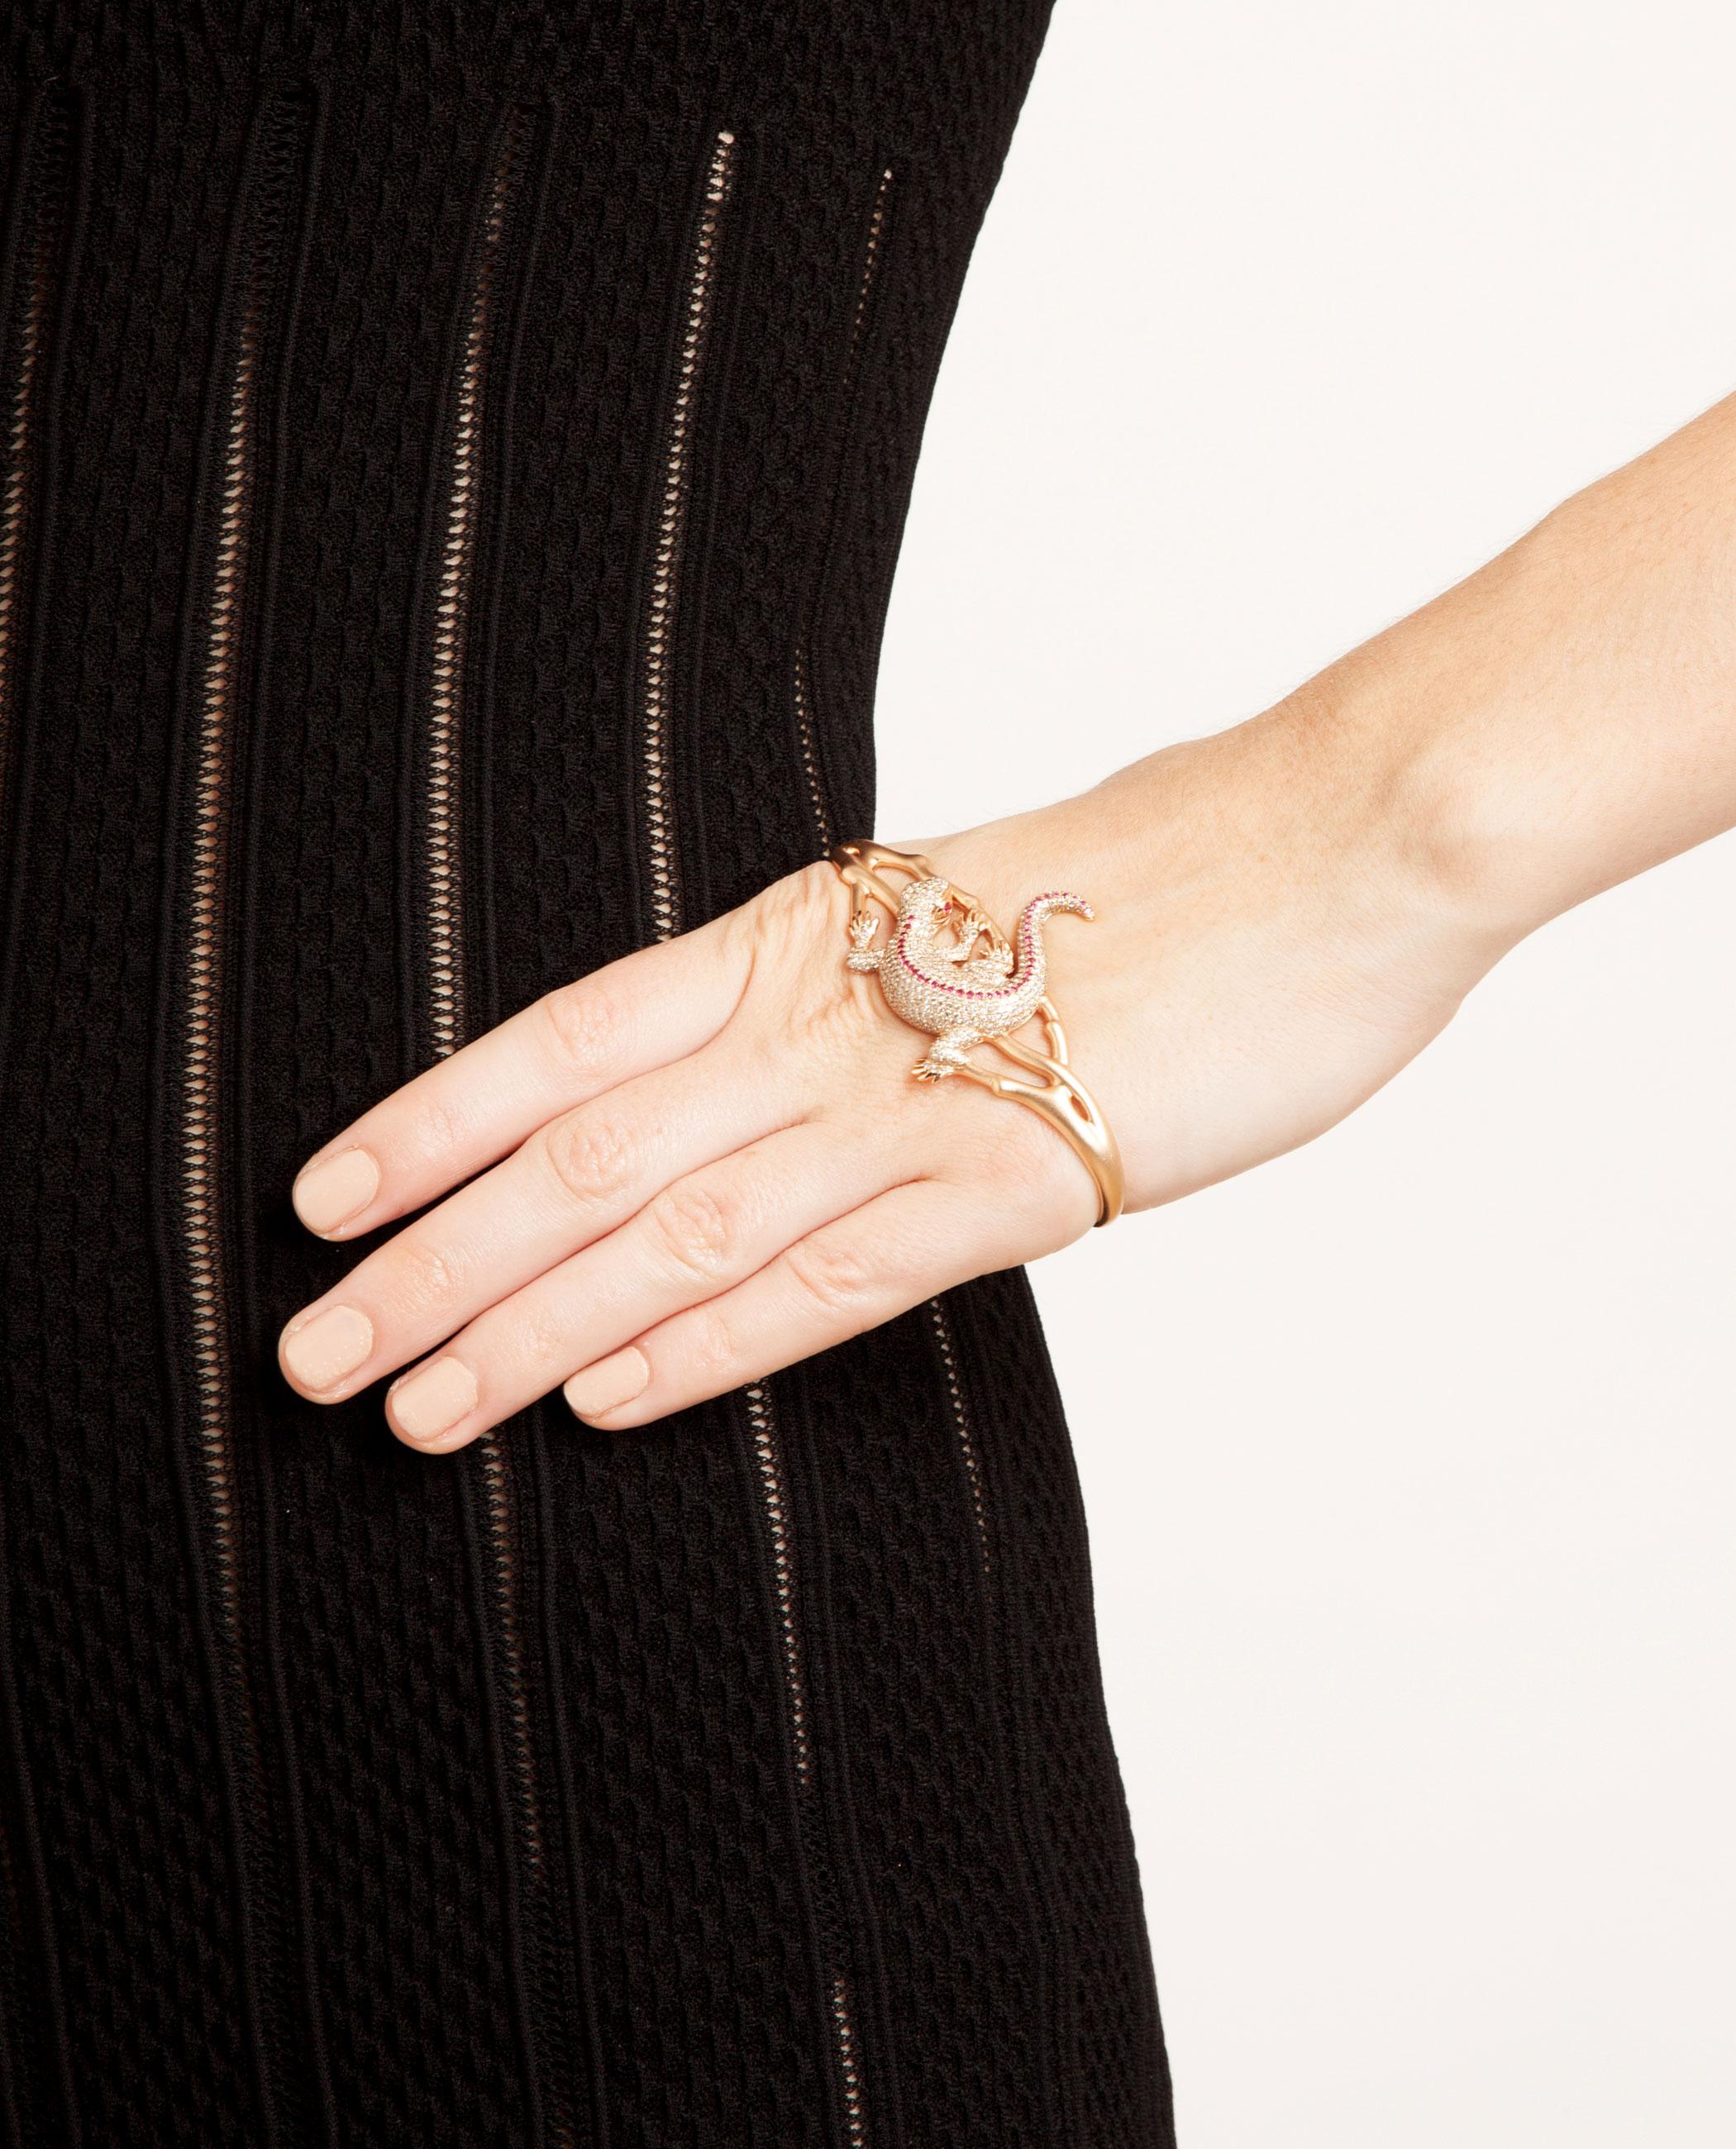 Gaydamak 18k Rose Gold and Ruby Iguane Hand Bracelet - Pink & Purple 1I8T6fT